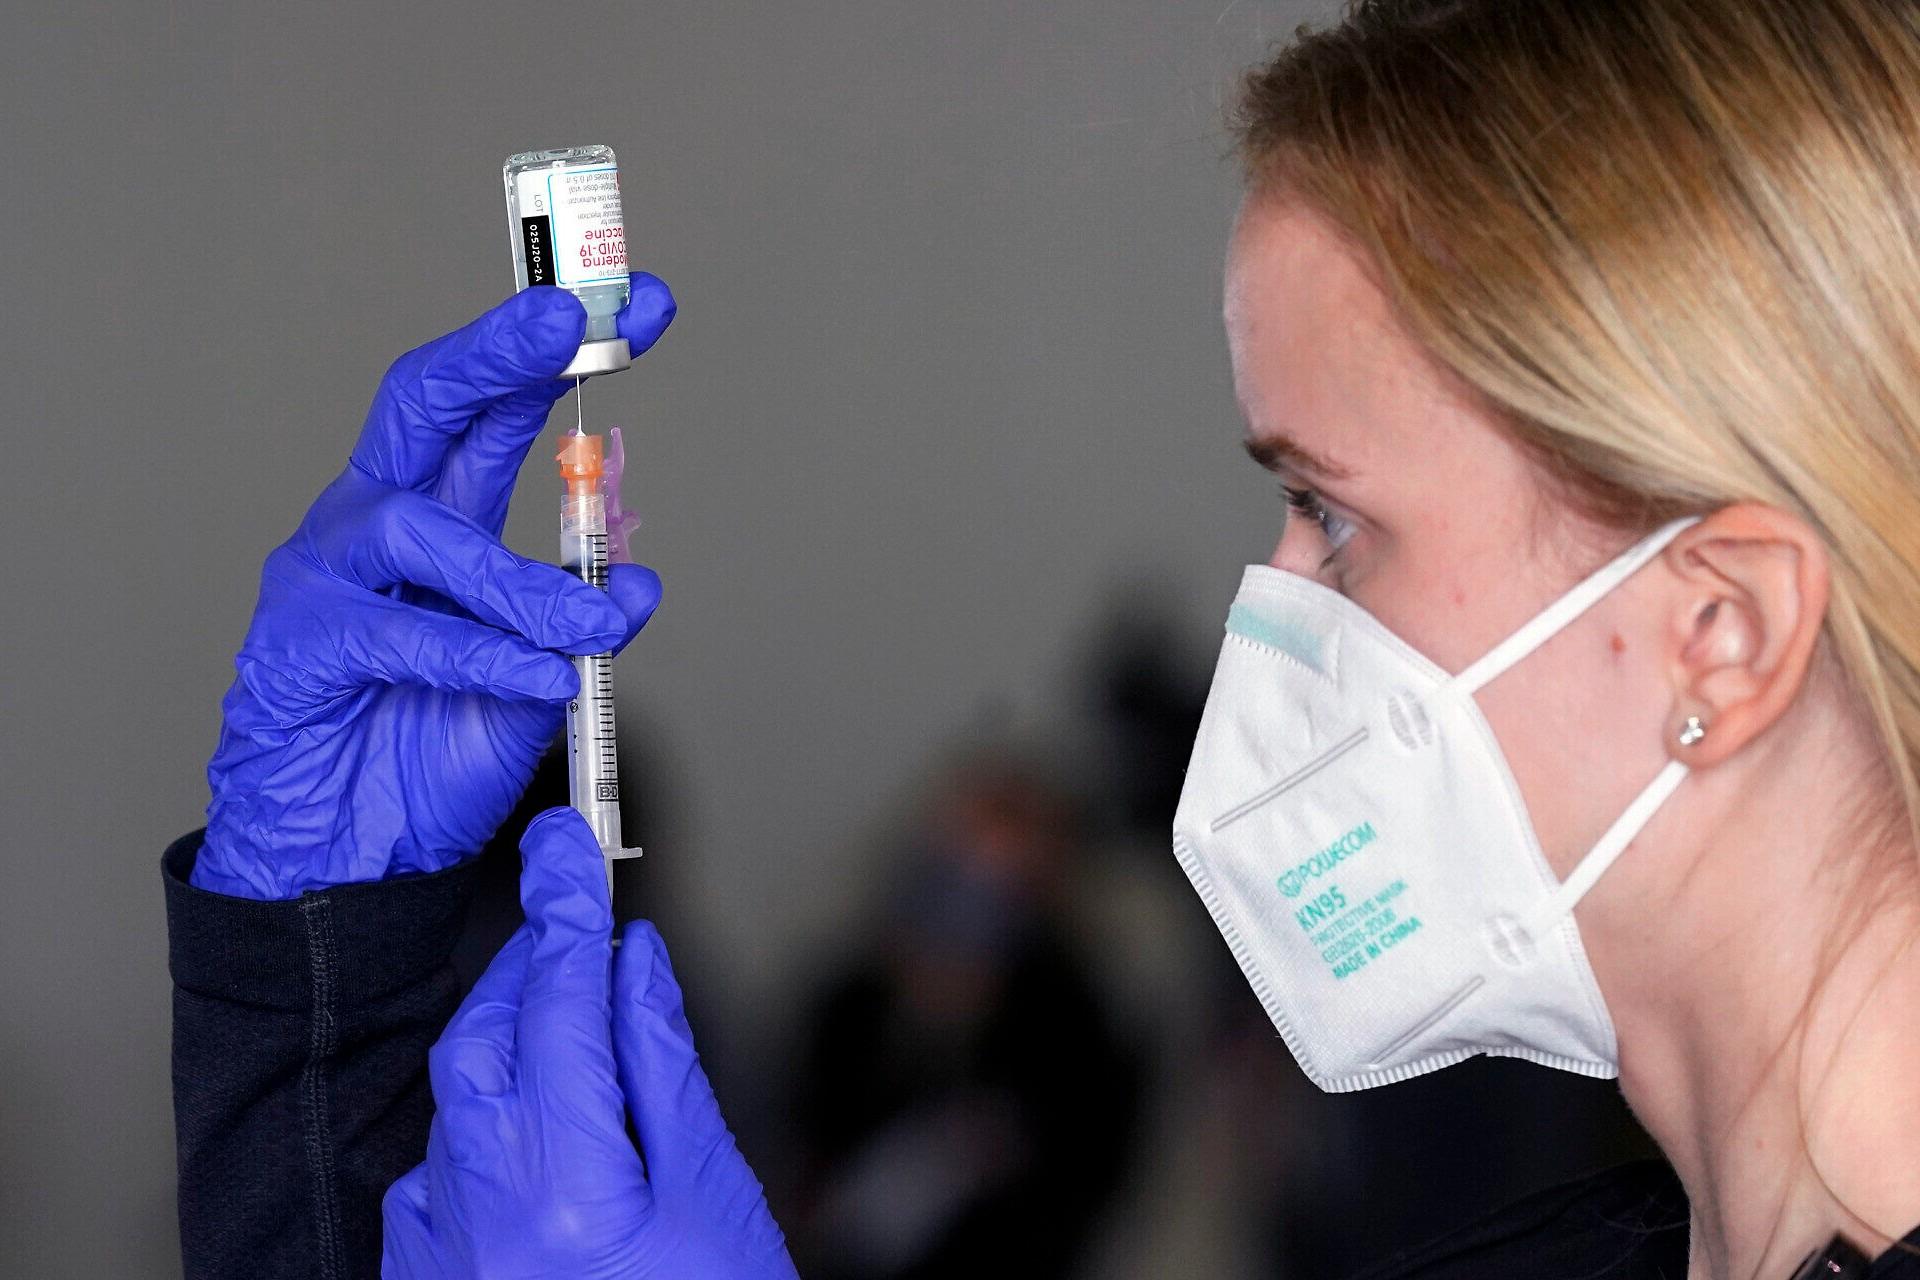 Medicinska sestra priprema vakcinu protiv koronavirusa, Sakramento (Kalifornija), 21. januar 2021. (Foto: AP Photo/Rich Pedroncelli)